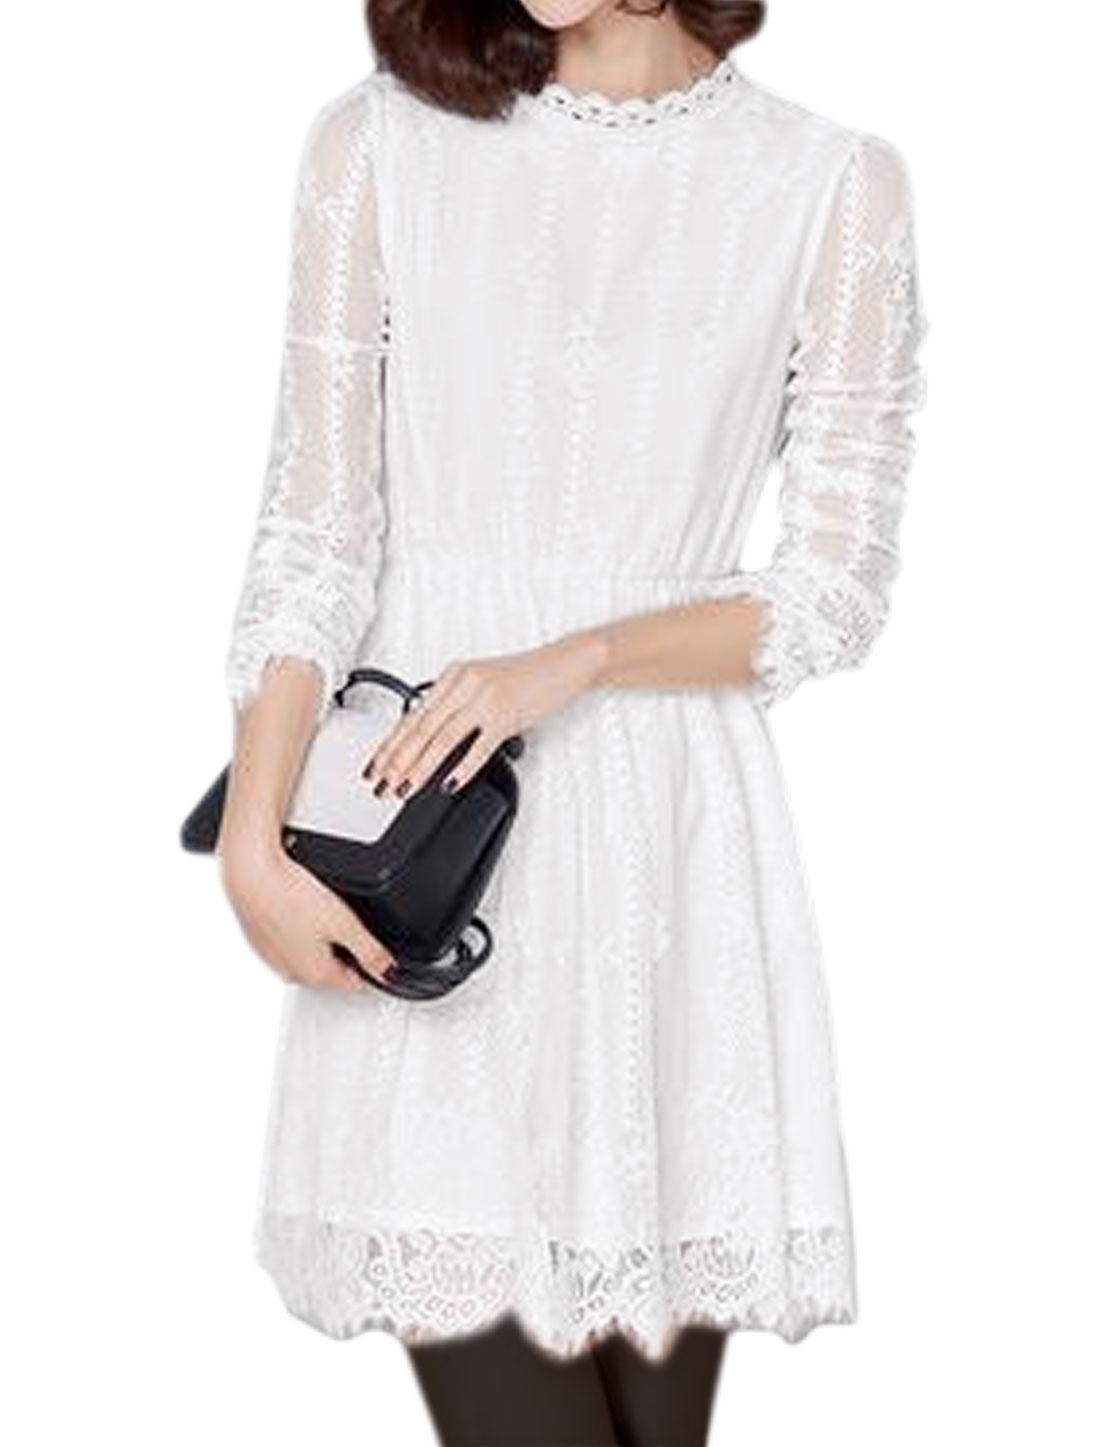 Women Scalloped Neck Elastic Waist Tunic Lace Top White M